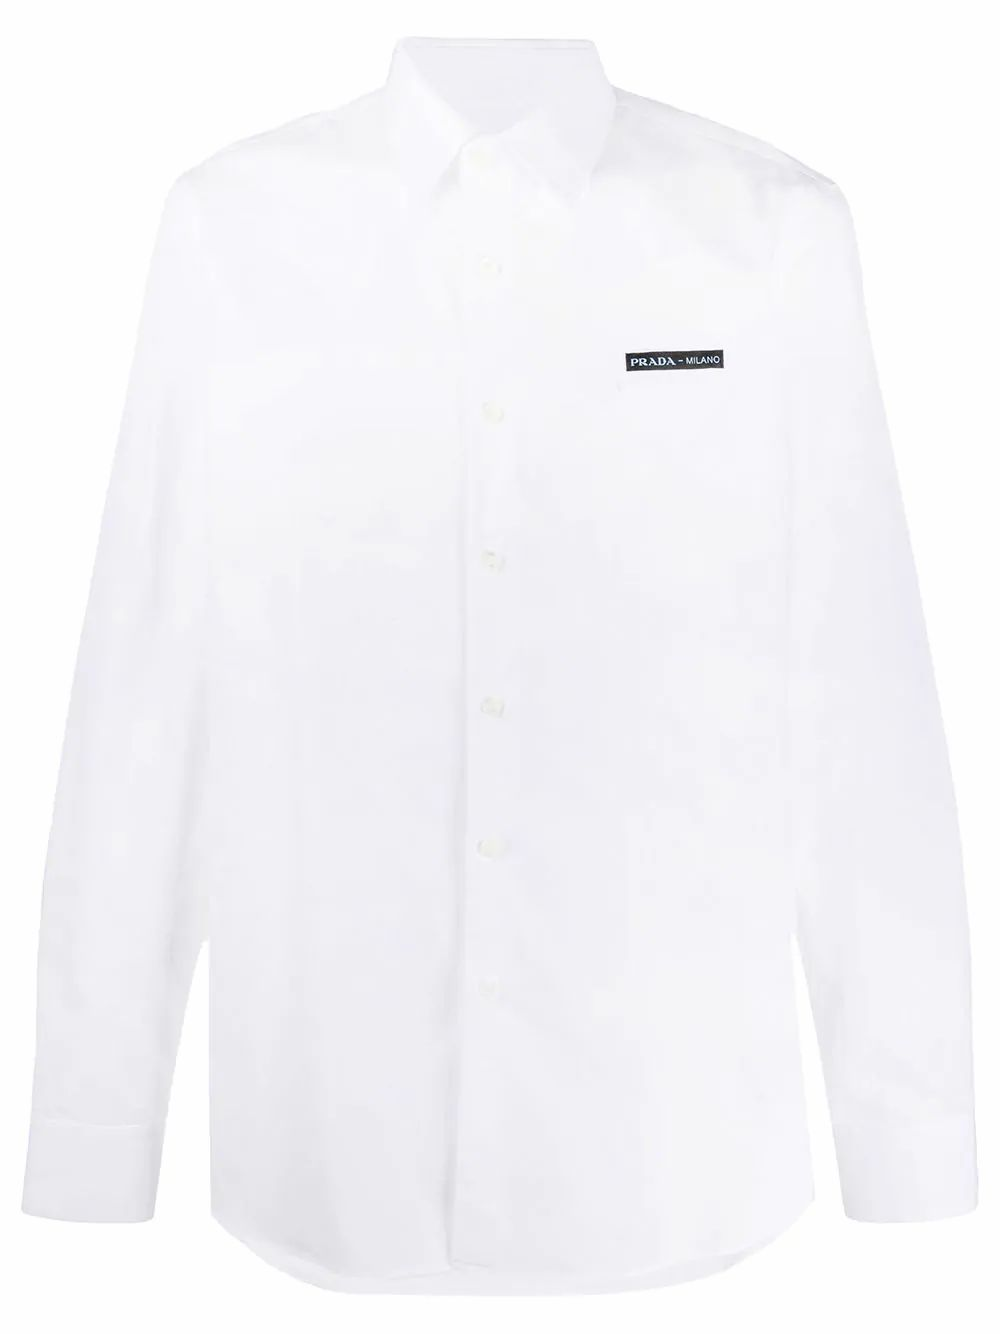 Prada Cottons PRADA MEN'S WHITE COTTON SHIRT